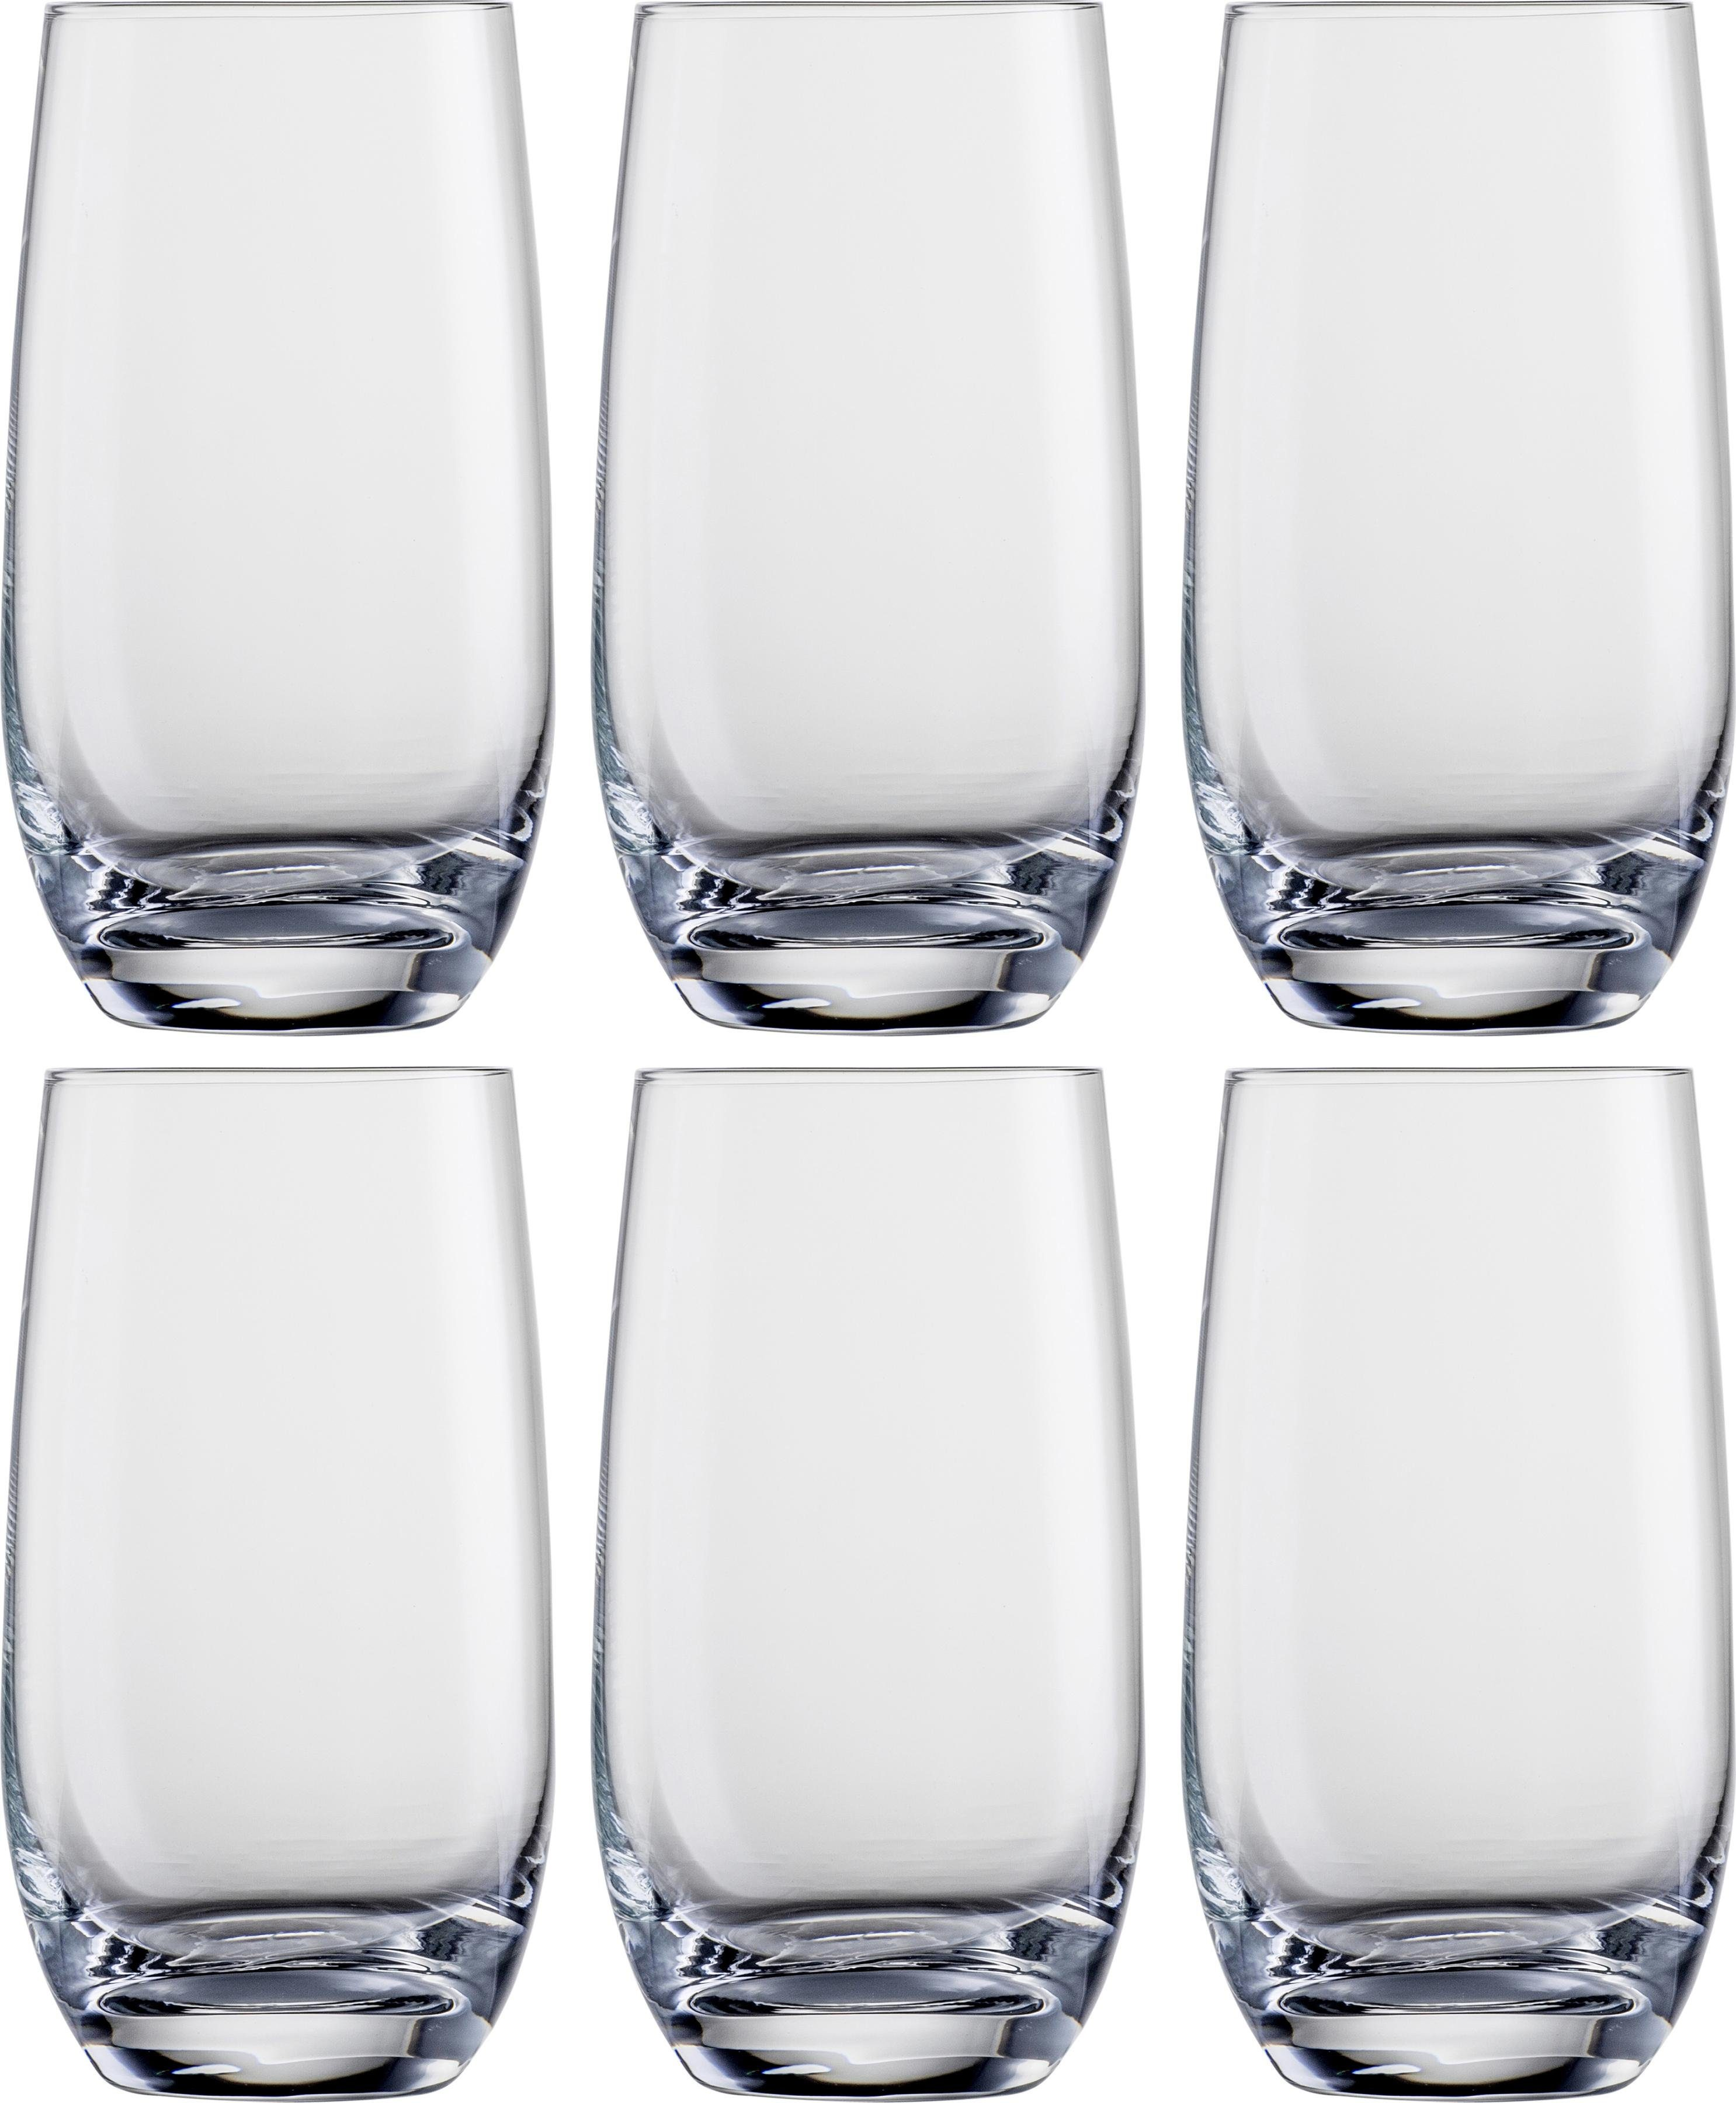 Eisch Longdrinkglas (6-tlg.) farblos Kristallgläser Gläser Glaswaren Haushaltswaren Trinkgefäße